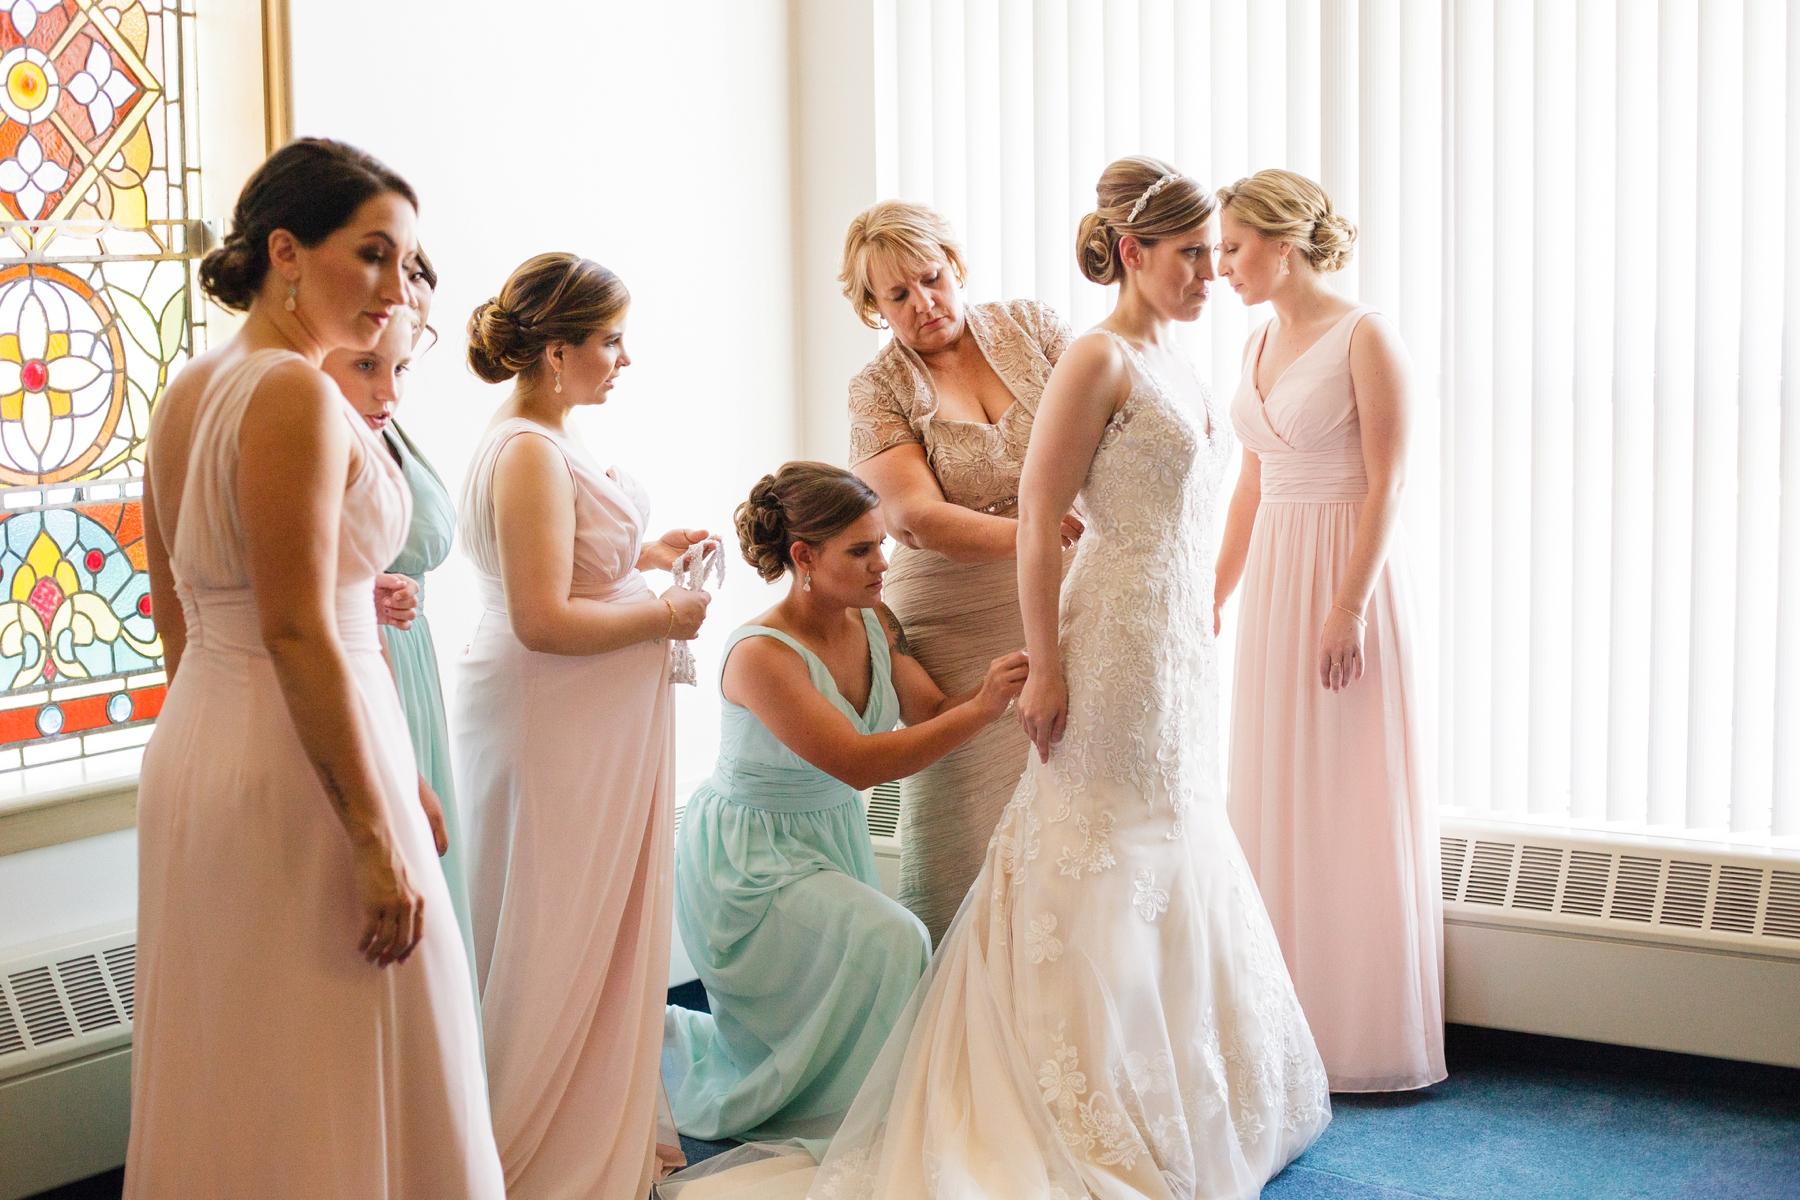 Ben_Jillian_Midland_Baycity_Wedding_0022.jpg